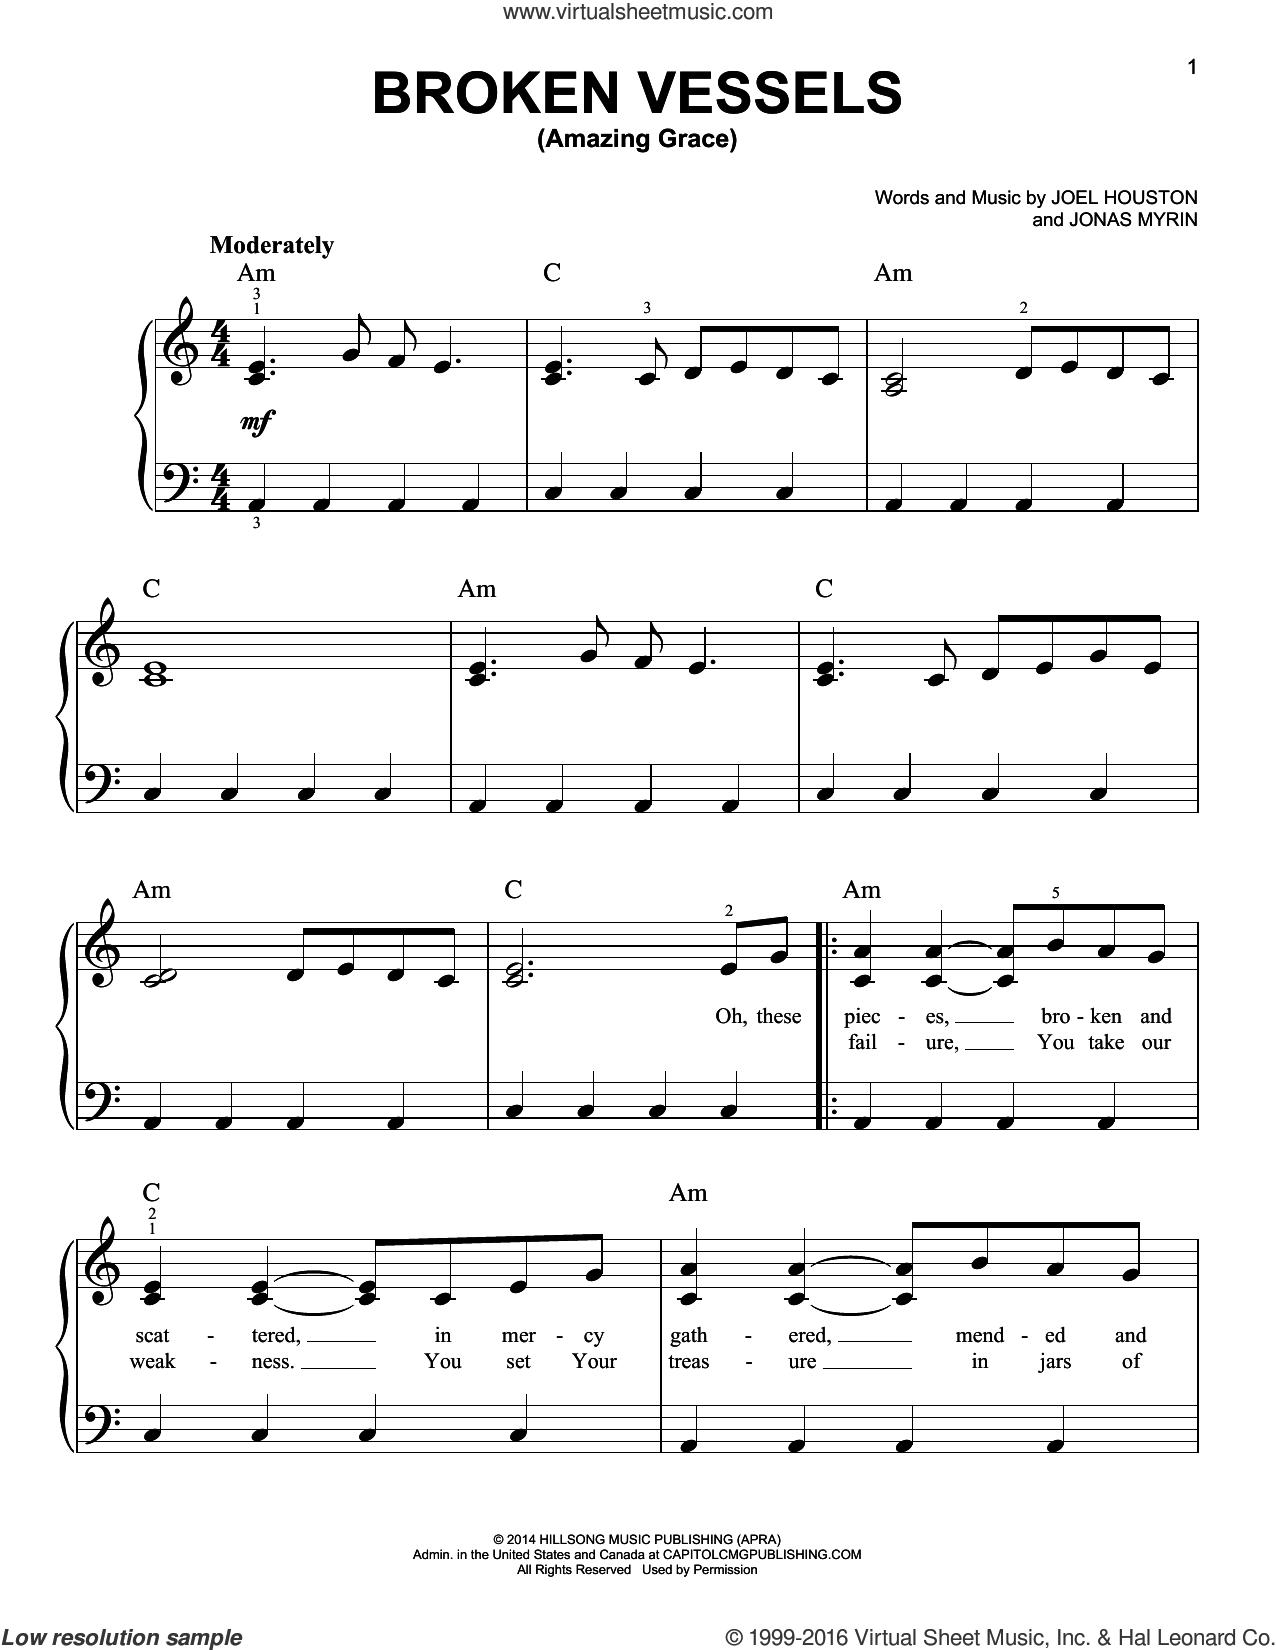 Broken Vessels (Amazing Grace) sheet music for piano solo by Hillsong Worship, Joel Houston and Jonas Myrin, easy skill level